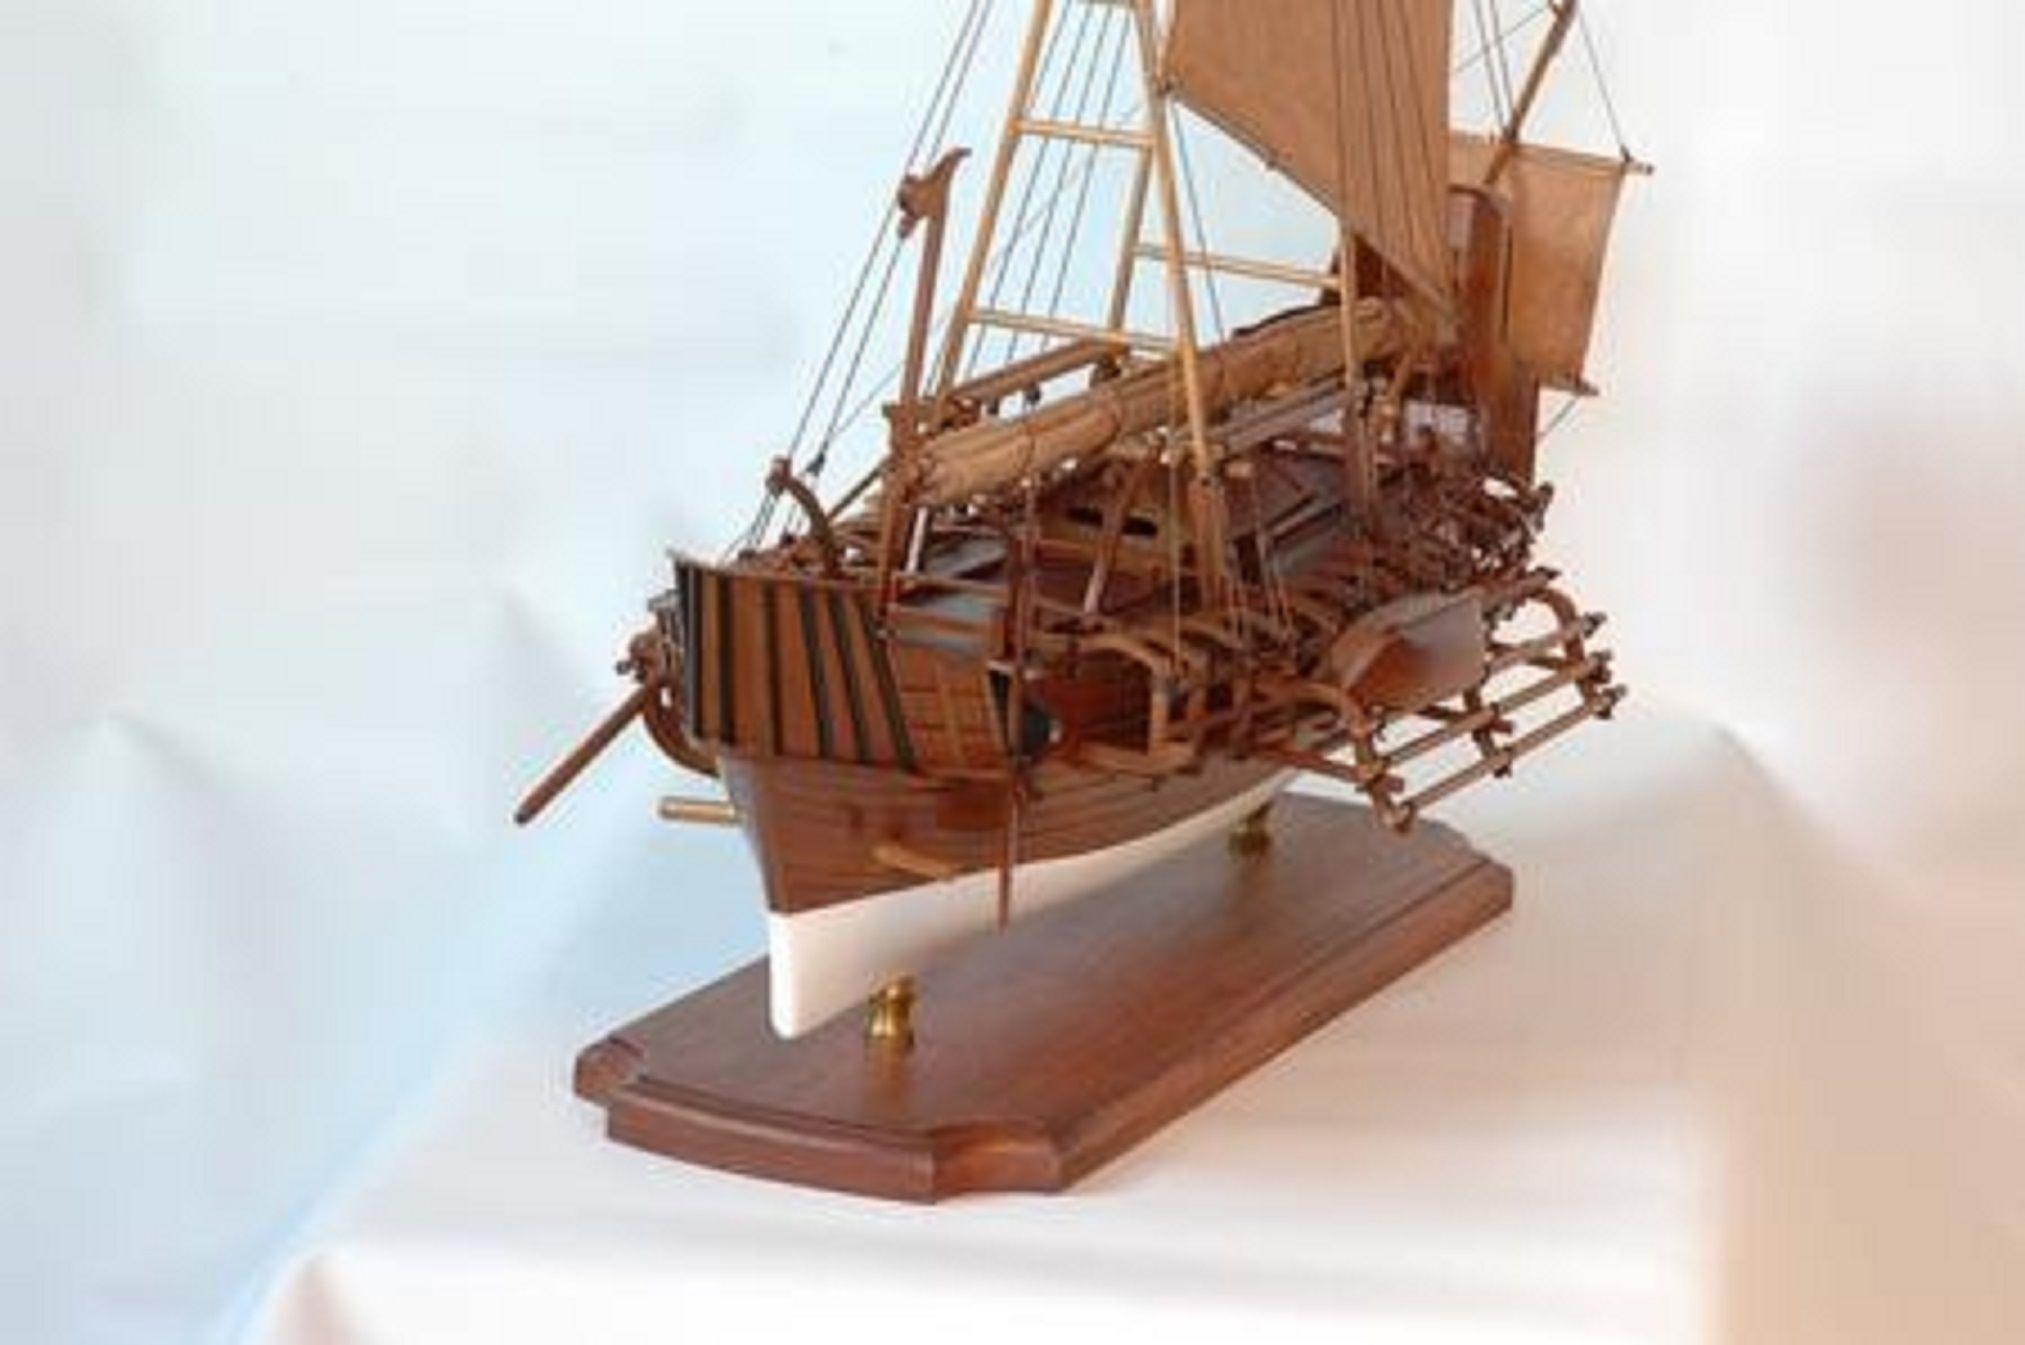 229-6982-Borobudur-model-ship-Premier-Range